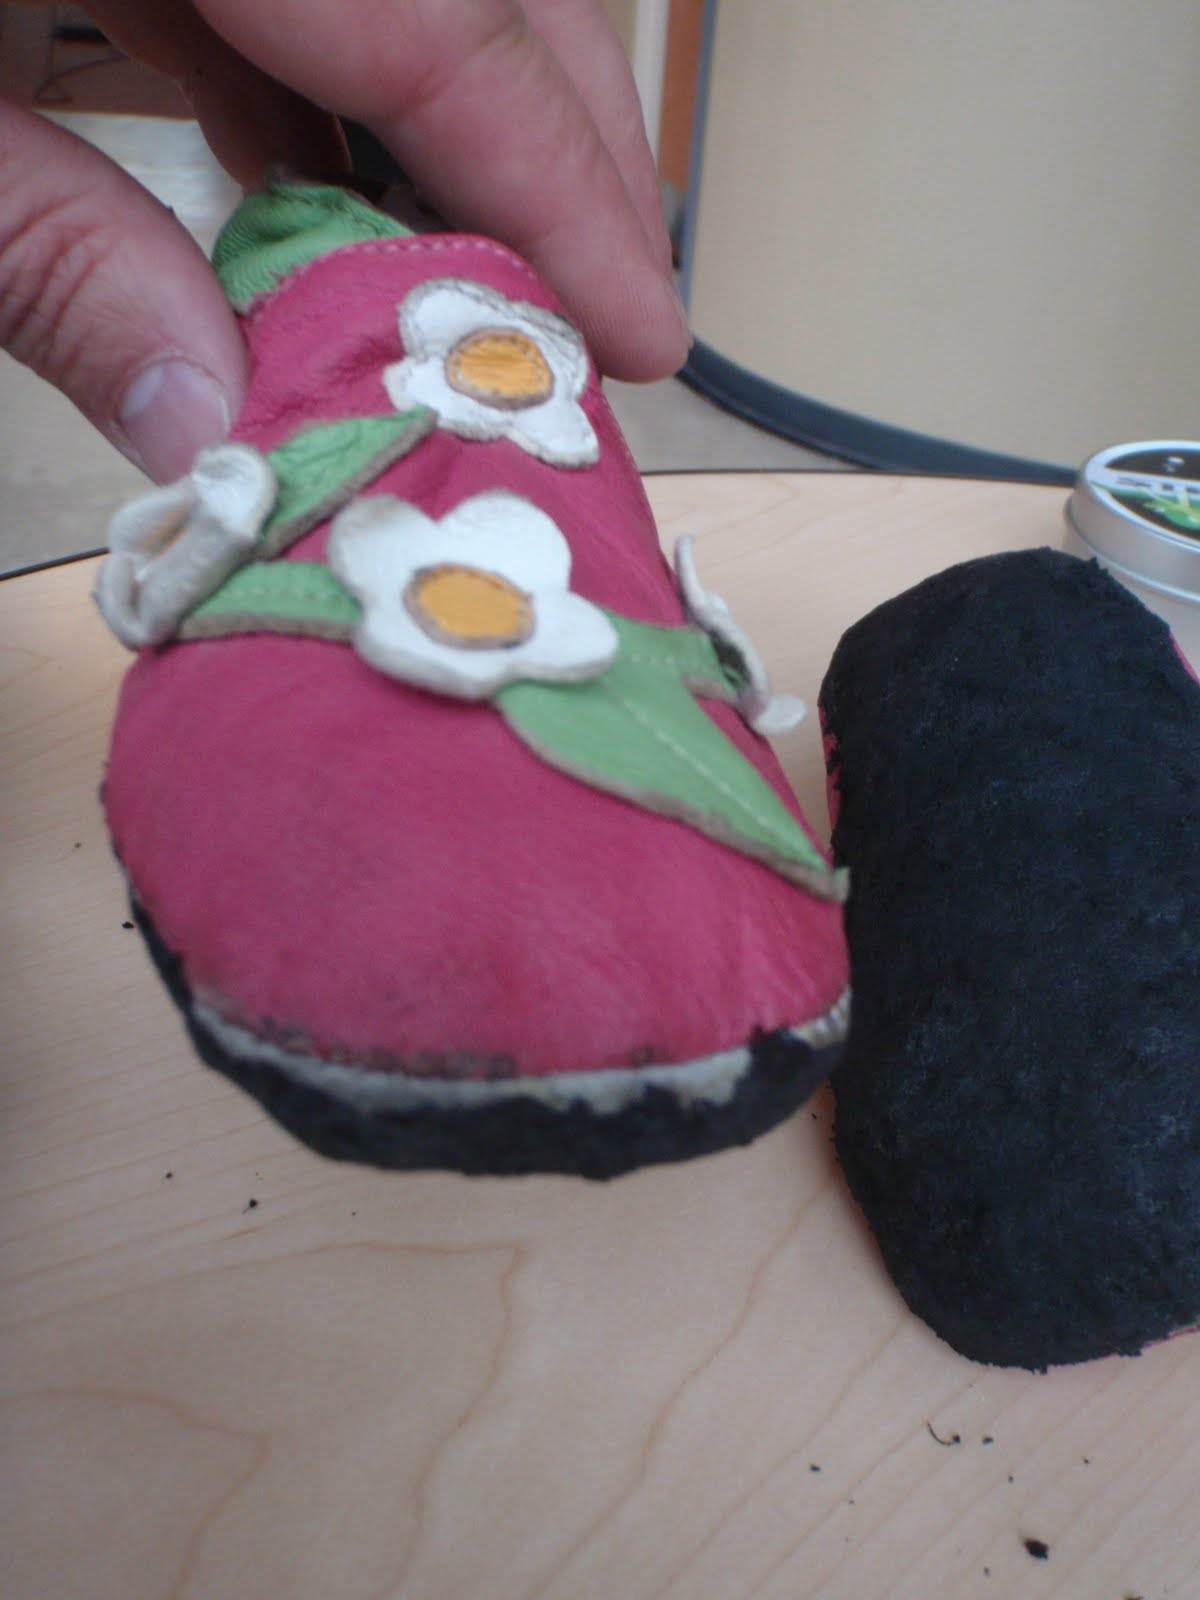 Athens Bouldering Shoes For A Quot Little Foot Quot